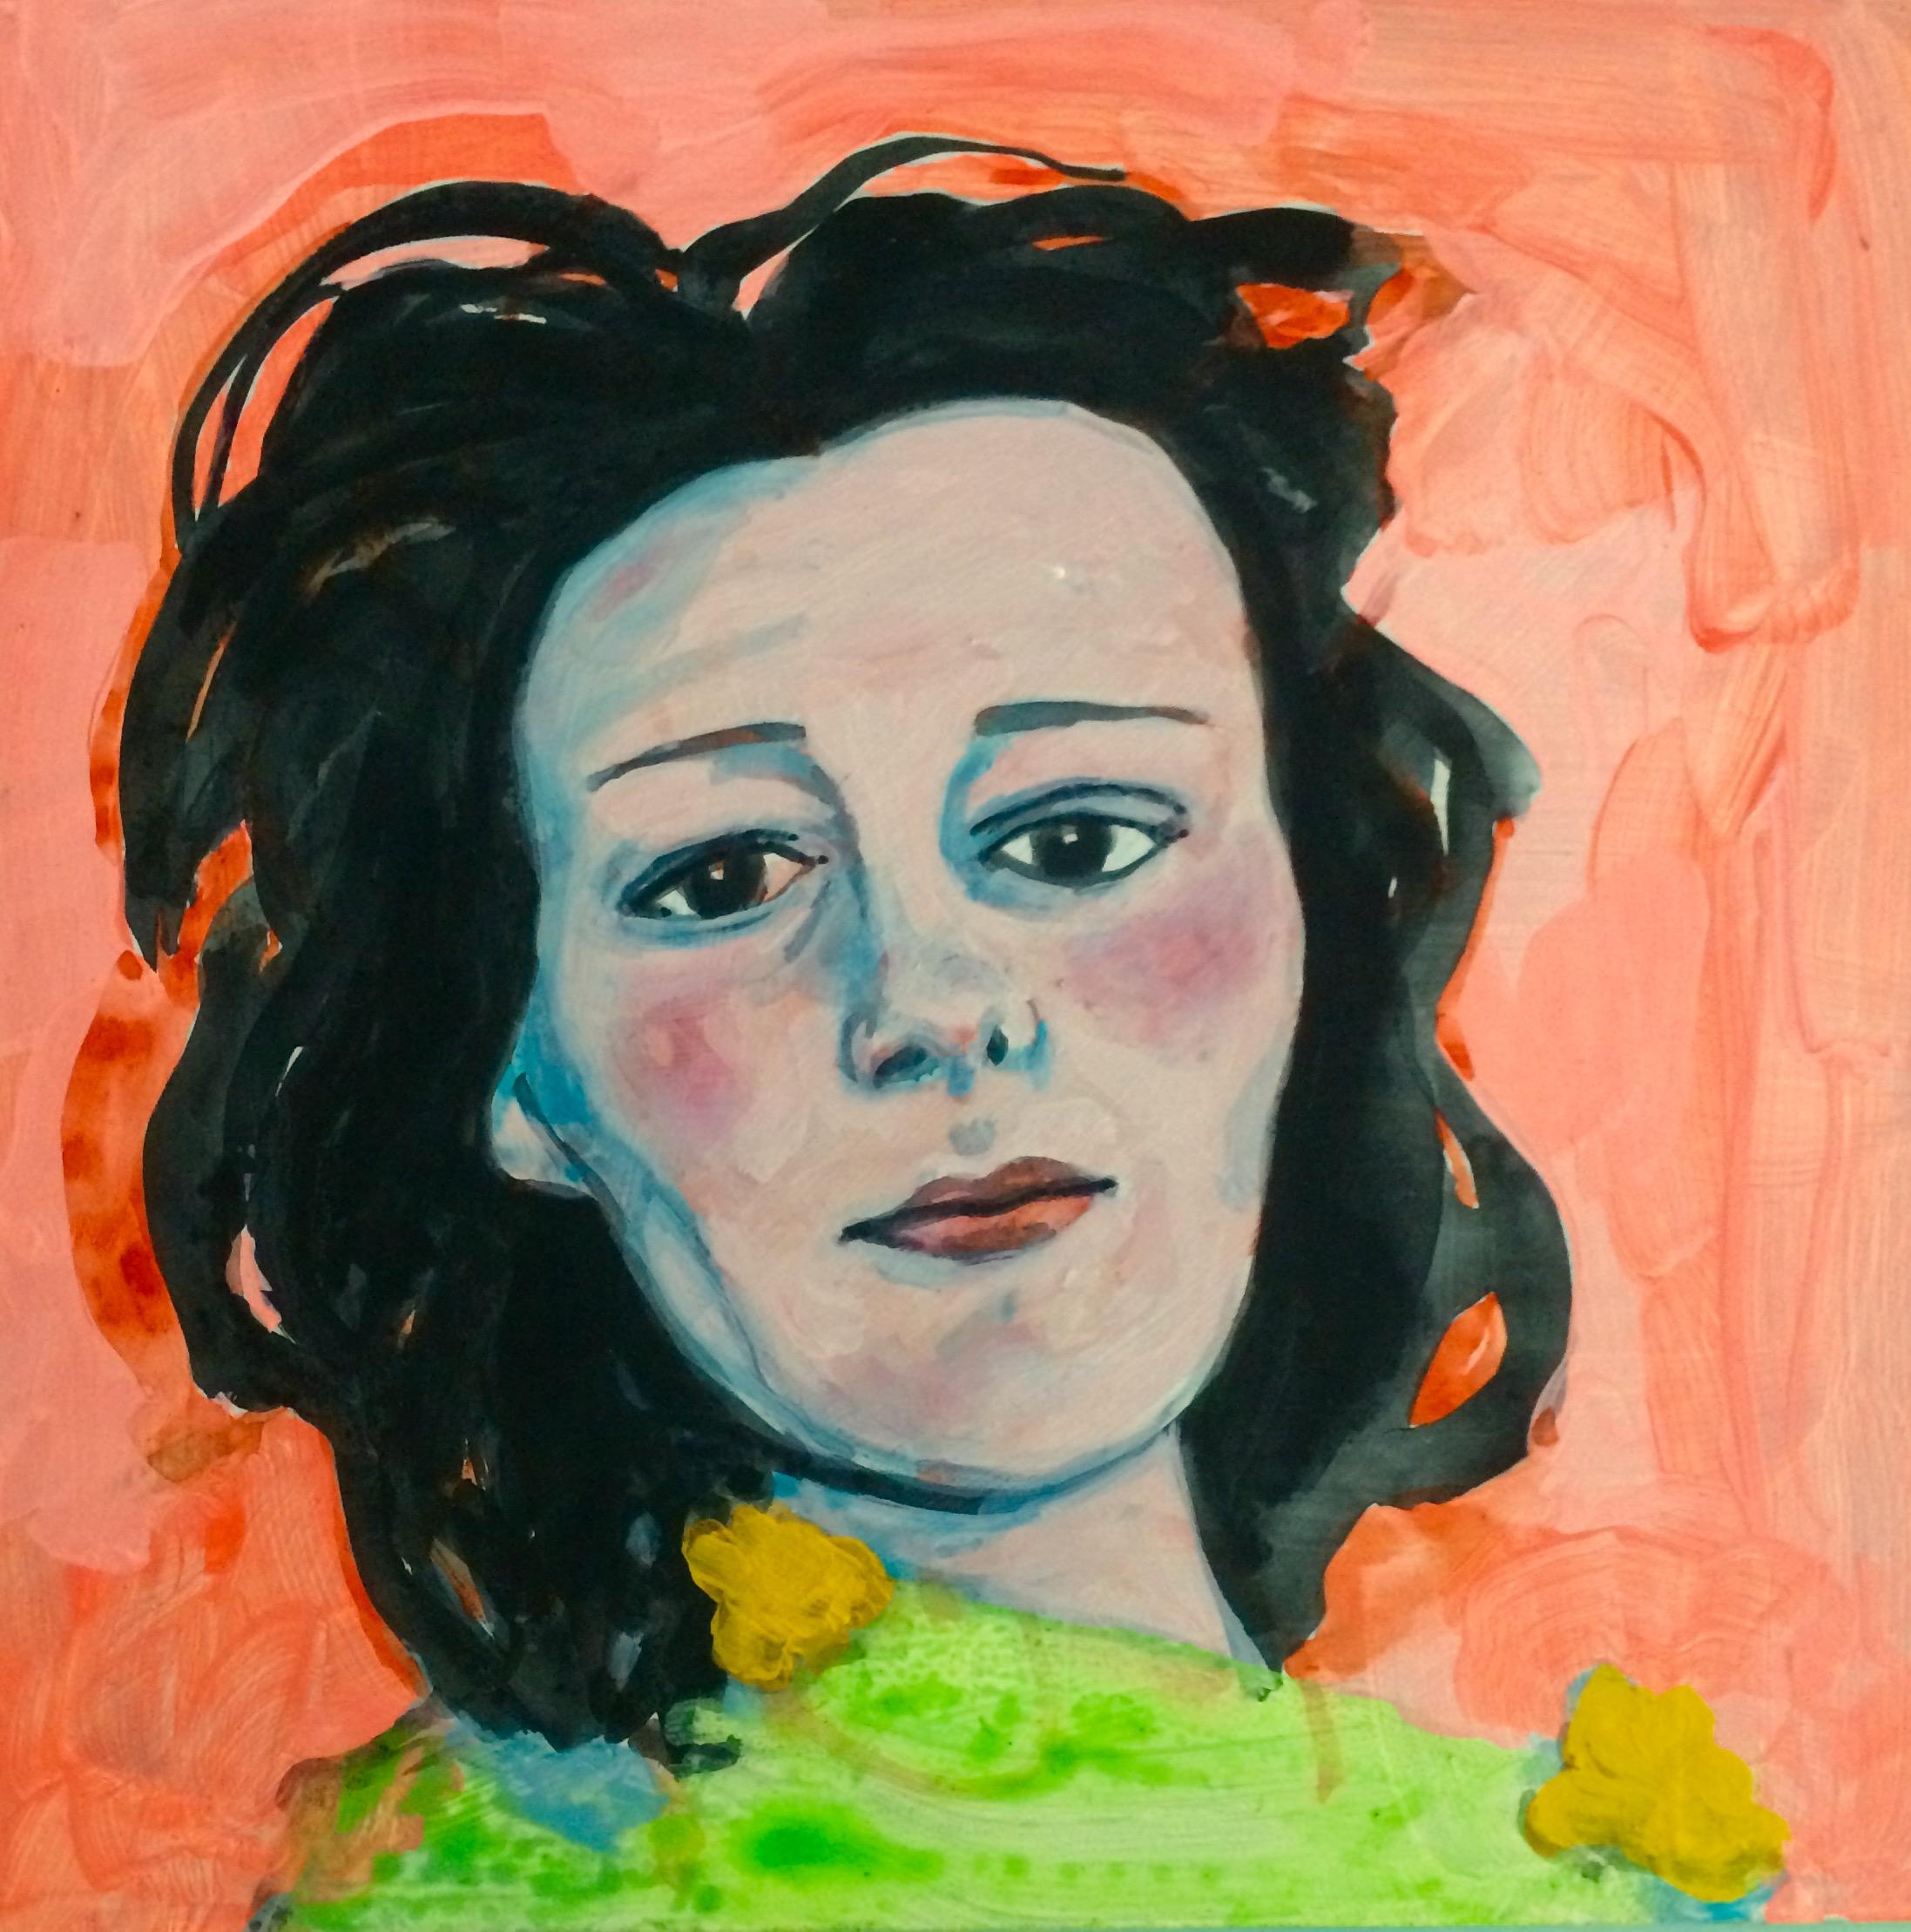 "ANNE SEXTON    watercolor, gouache, acrylic on masonite, 8 x 8"", 2015"